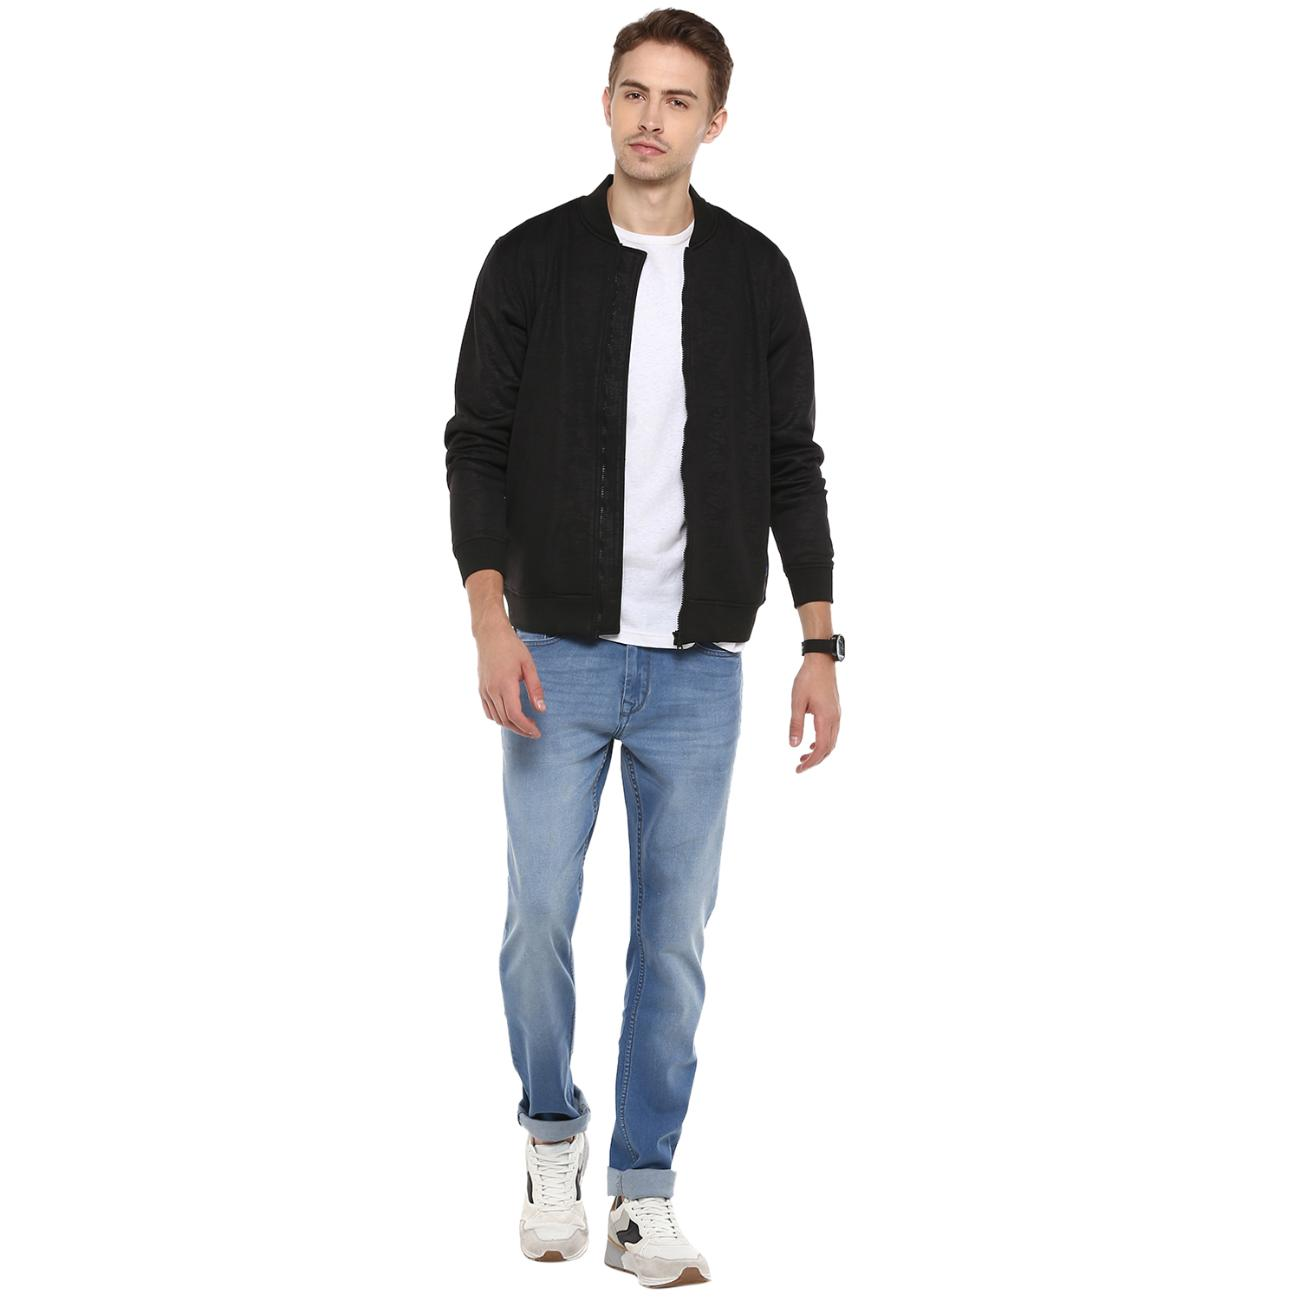 Shop Black Zipper Bomber Jacket Online